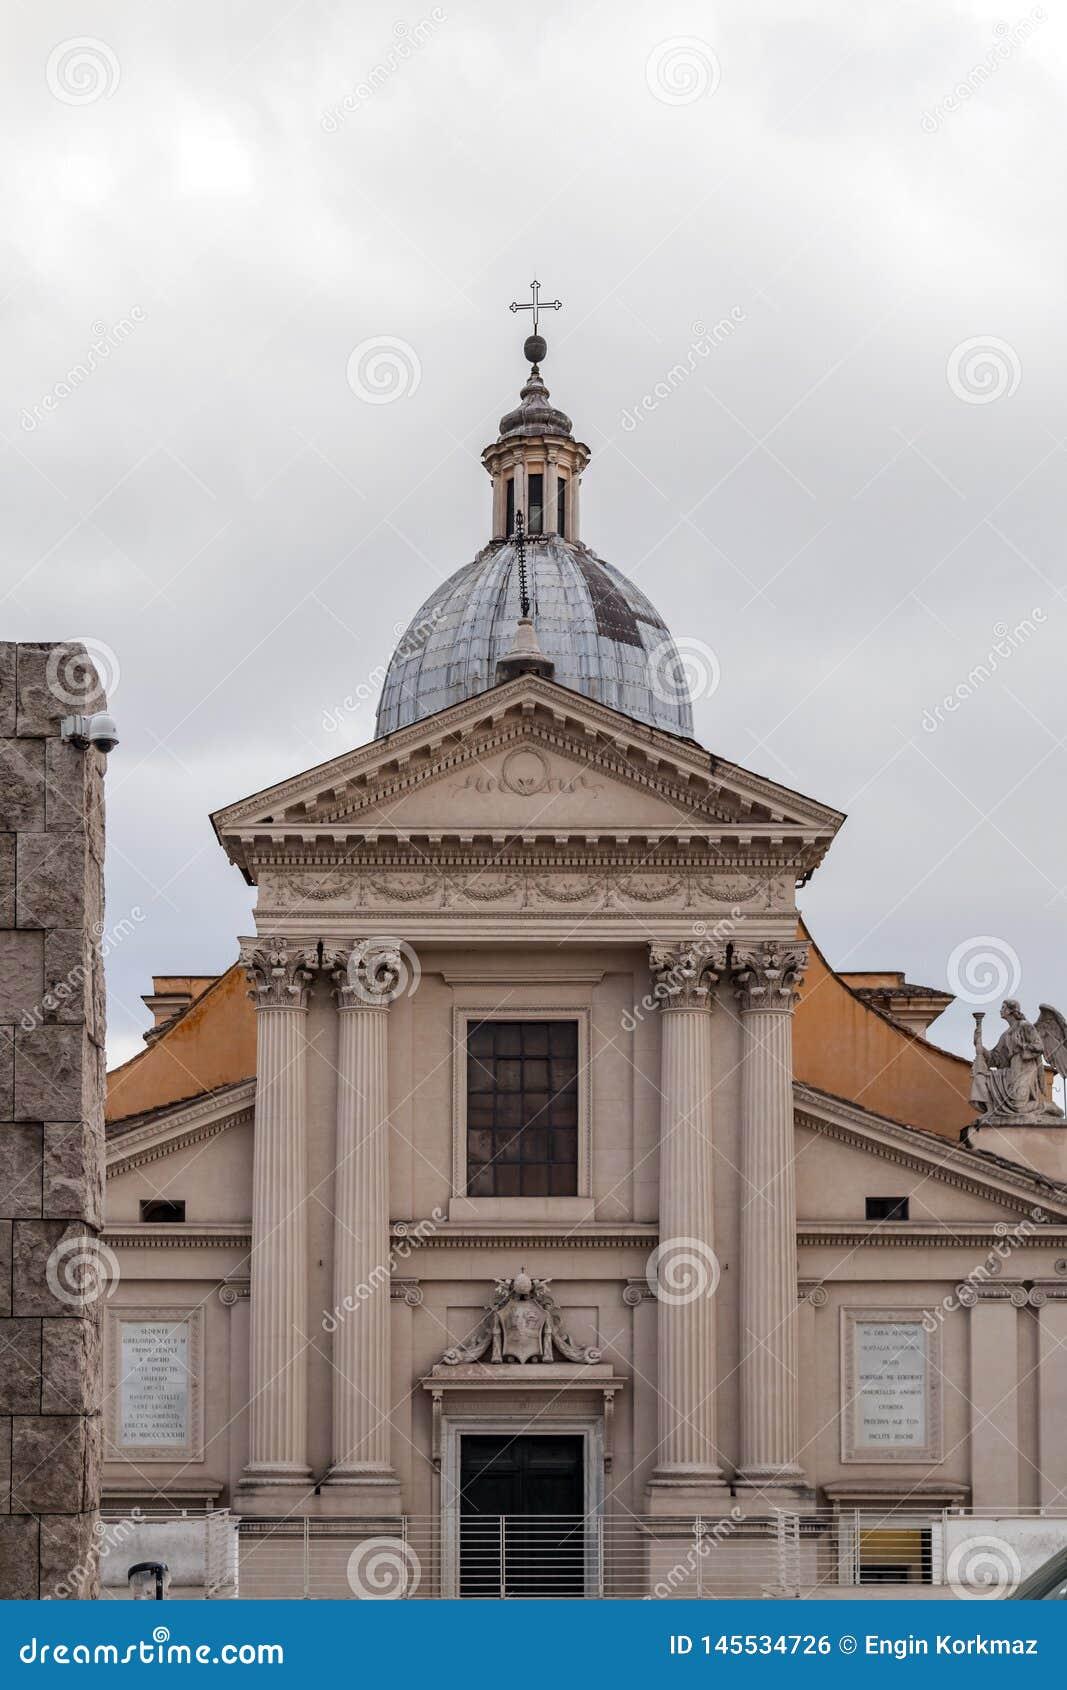 Chiesa di San Rocco or St. Roch Church in Rome, Italy